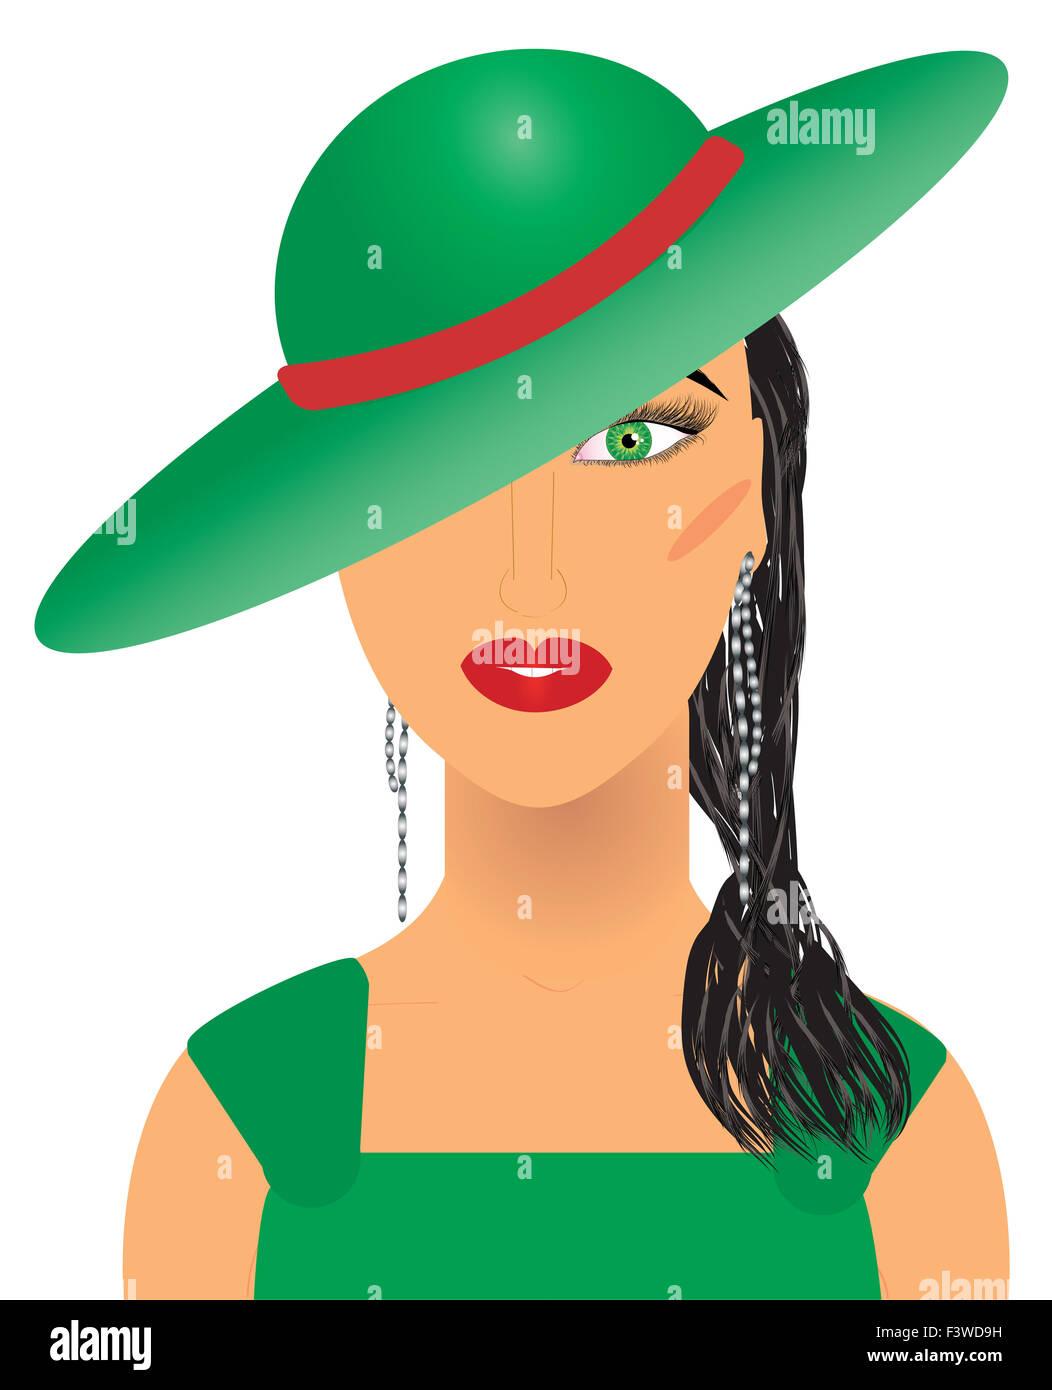 Aristocratic woman - Stock Image